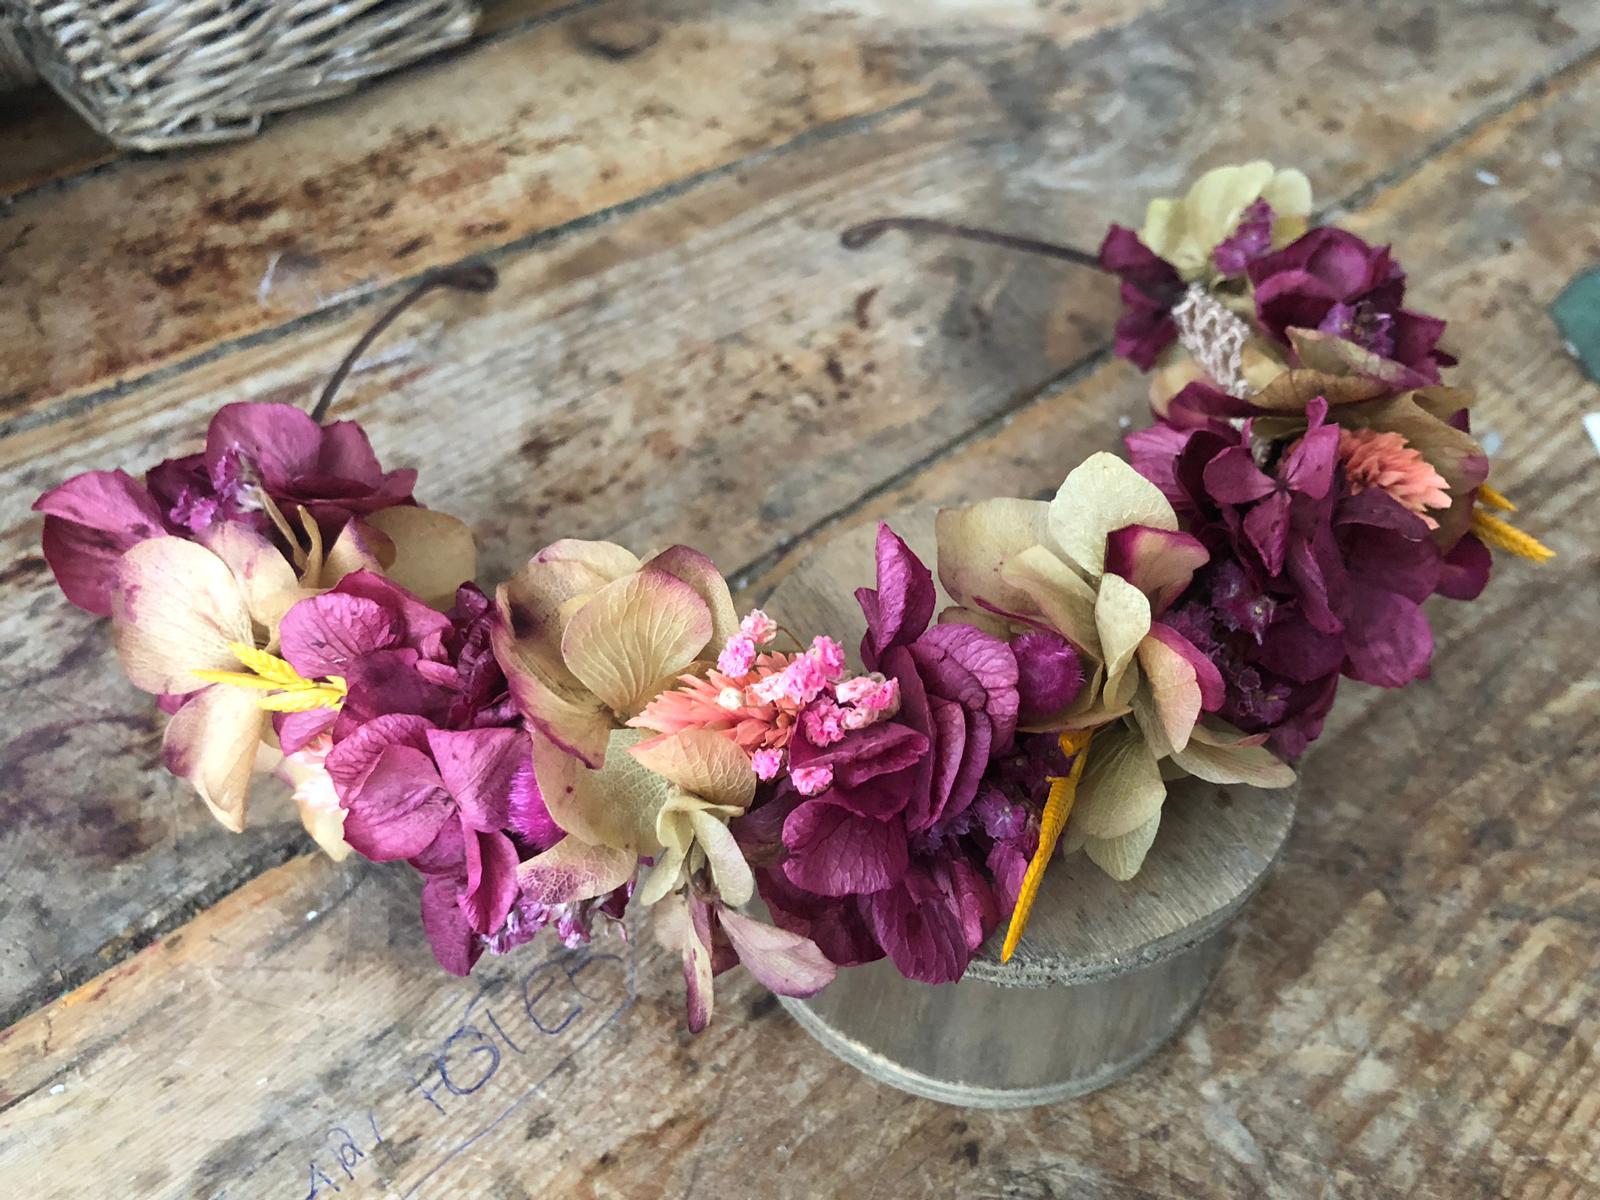 Media corona en flor preservada silvestre